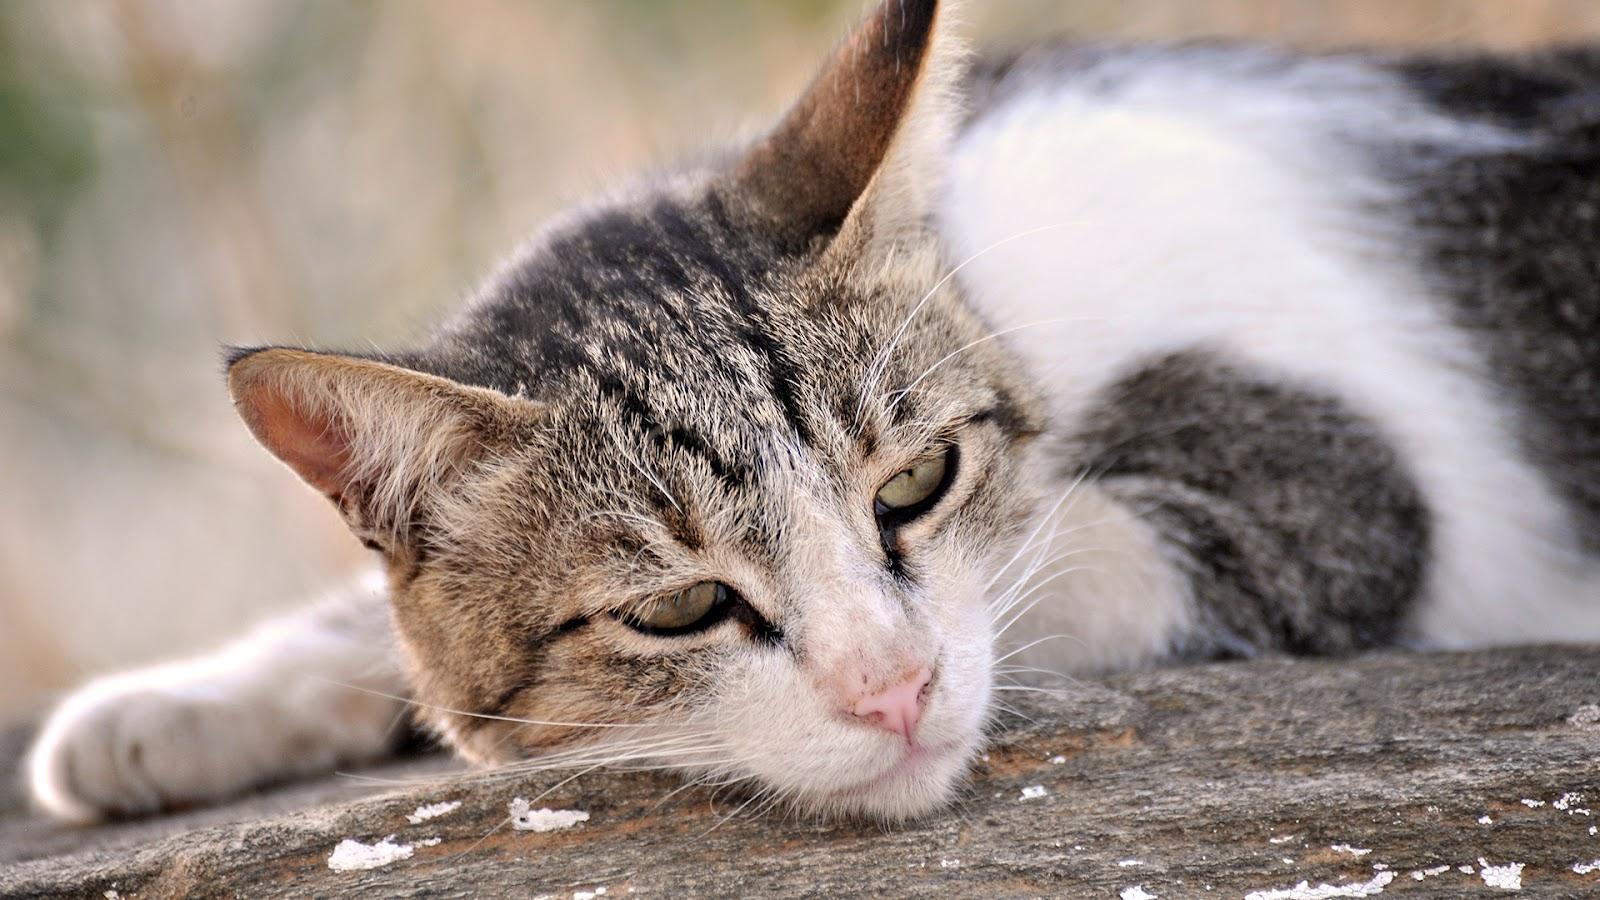 sad+cat.jpg